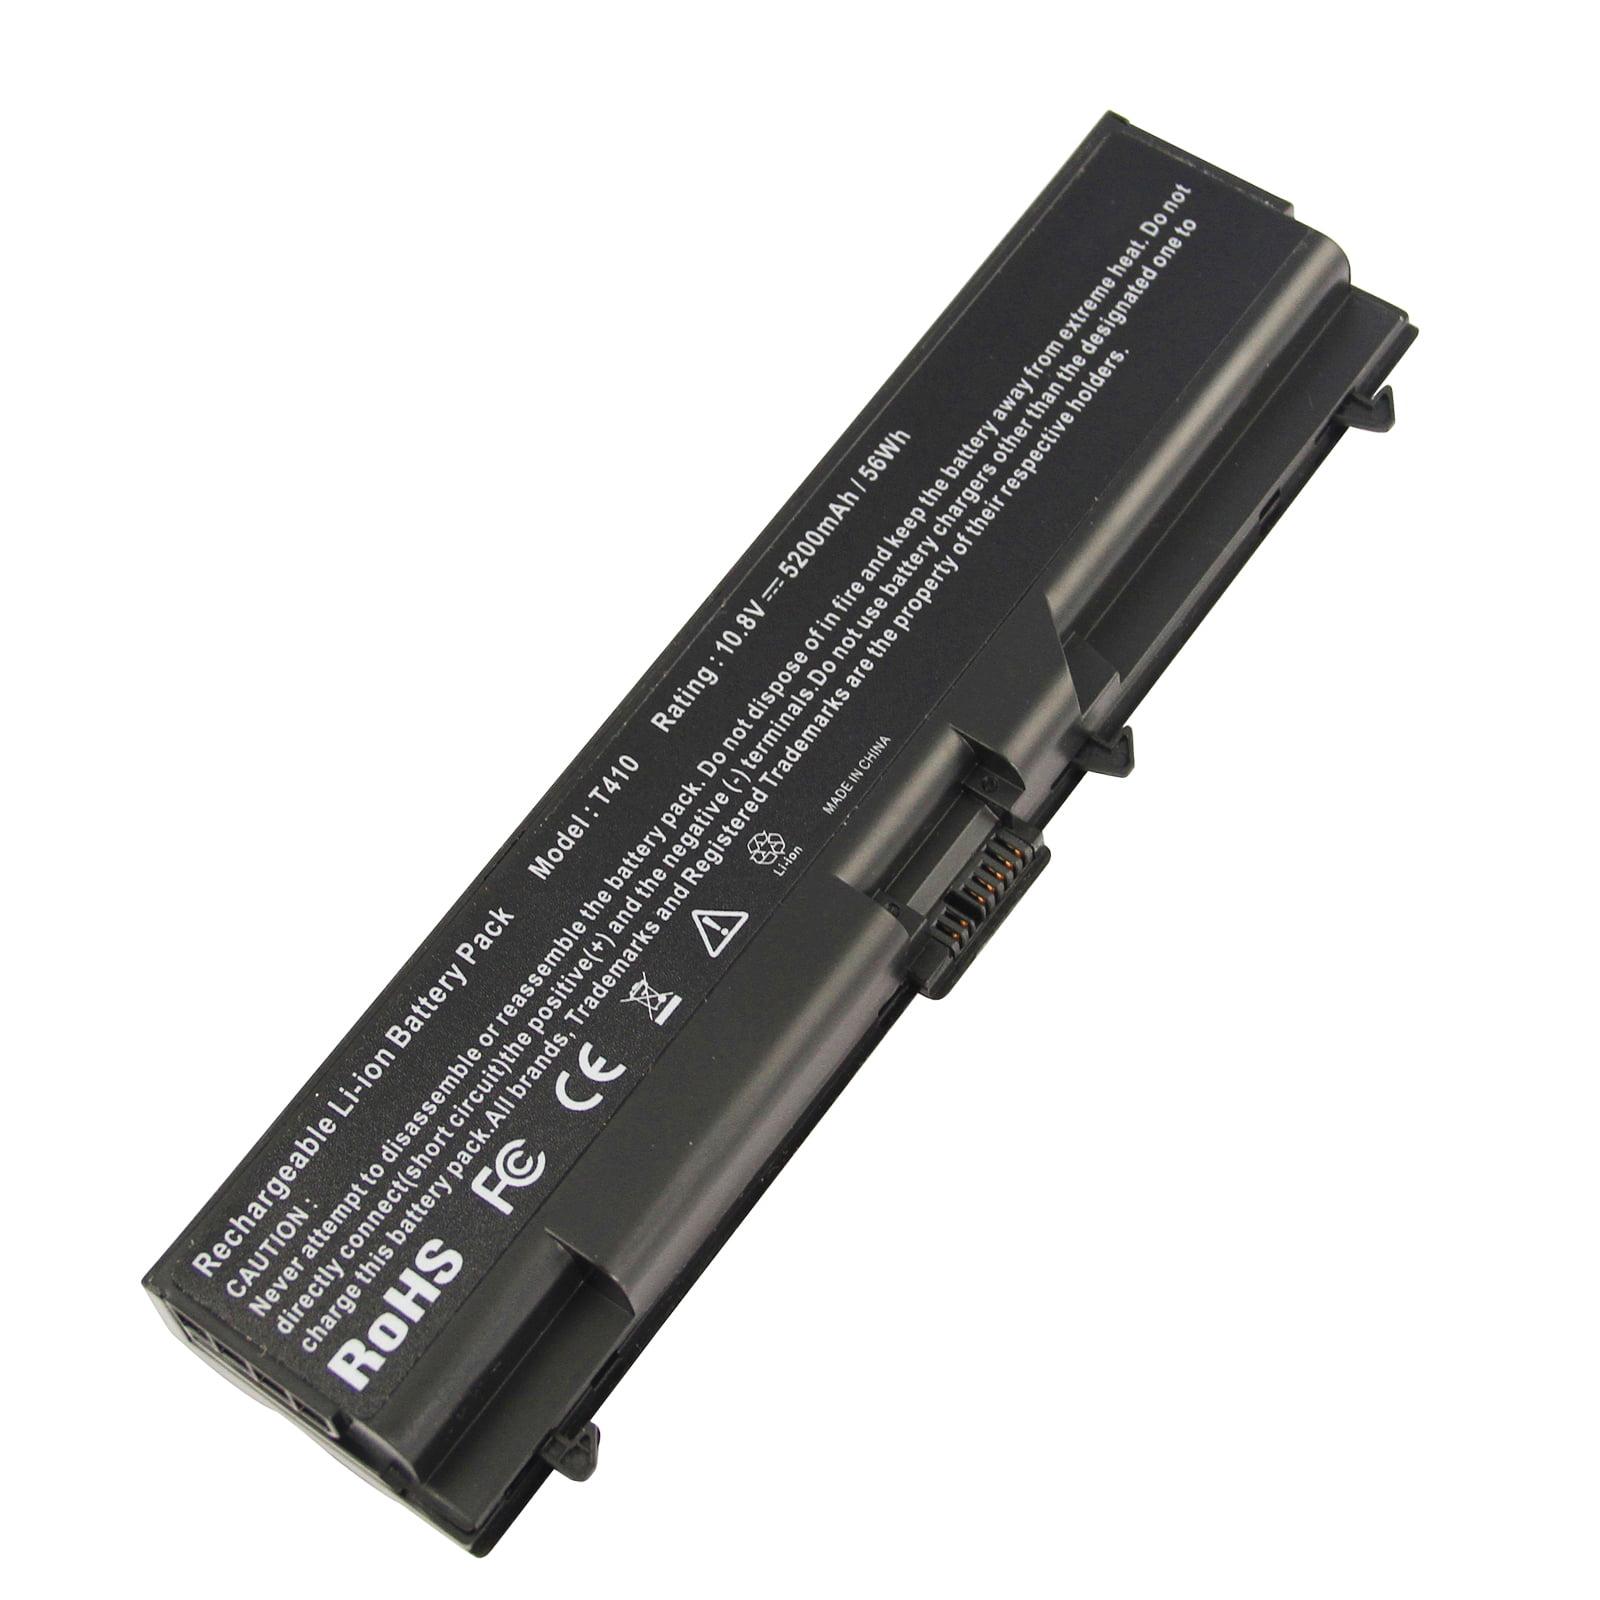 Laptop Battery for Lenovo ThinkPad L420 L421 L510 L512 L520 T420 T510 T520